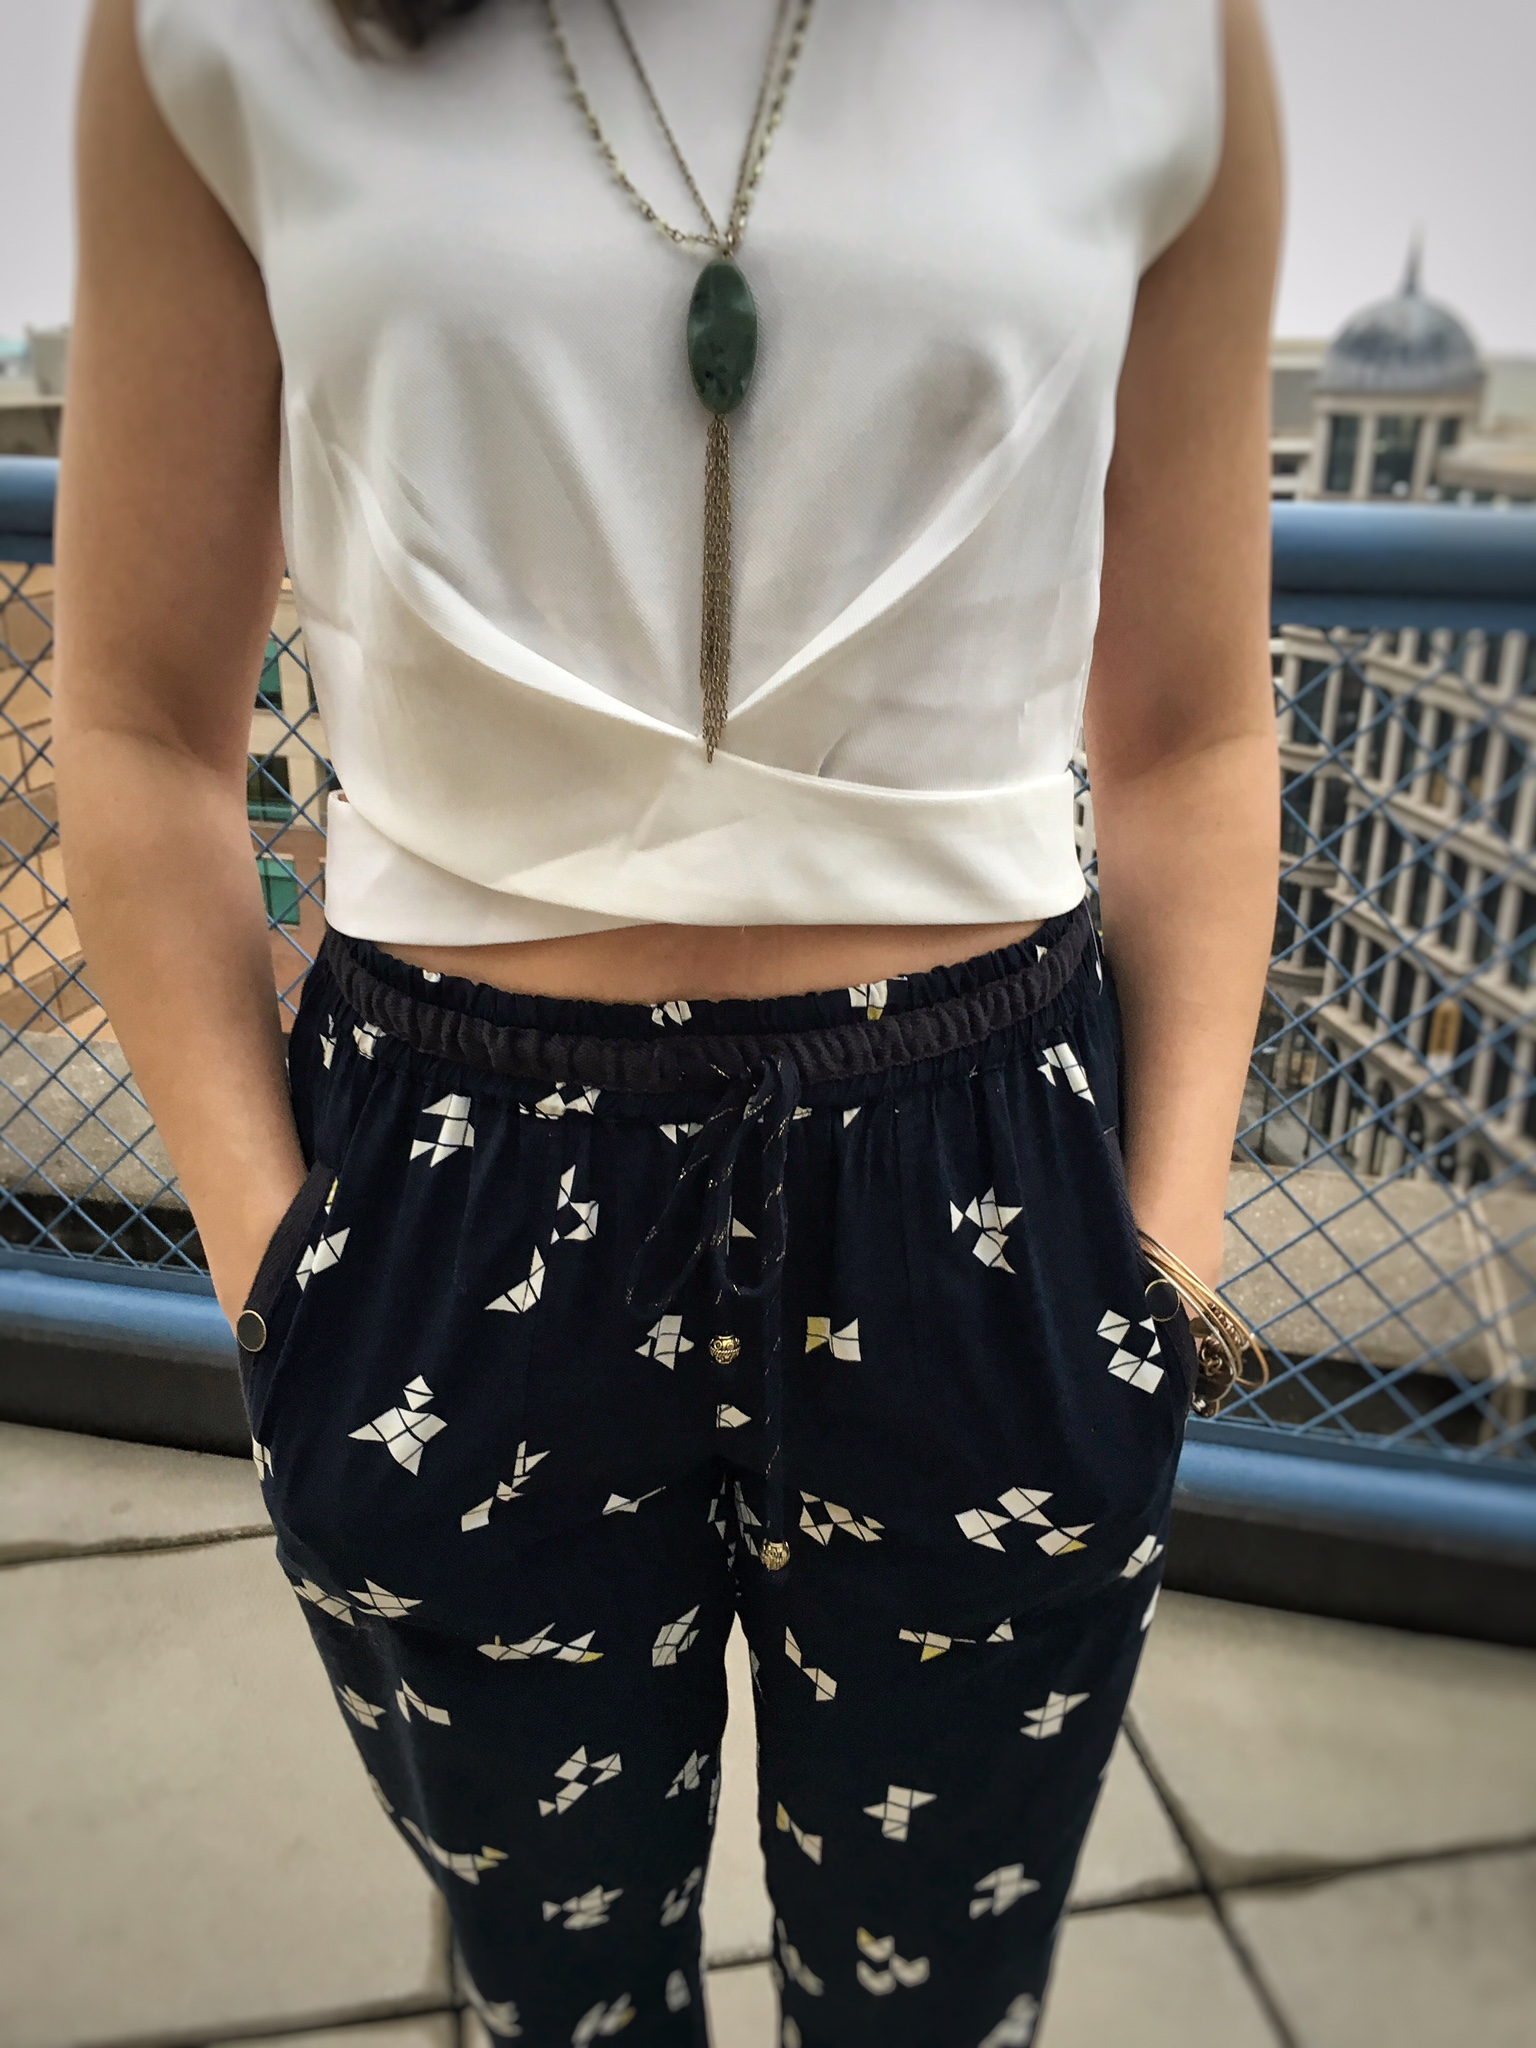 glass of glam - printed pants